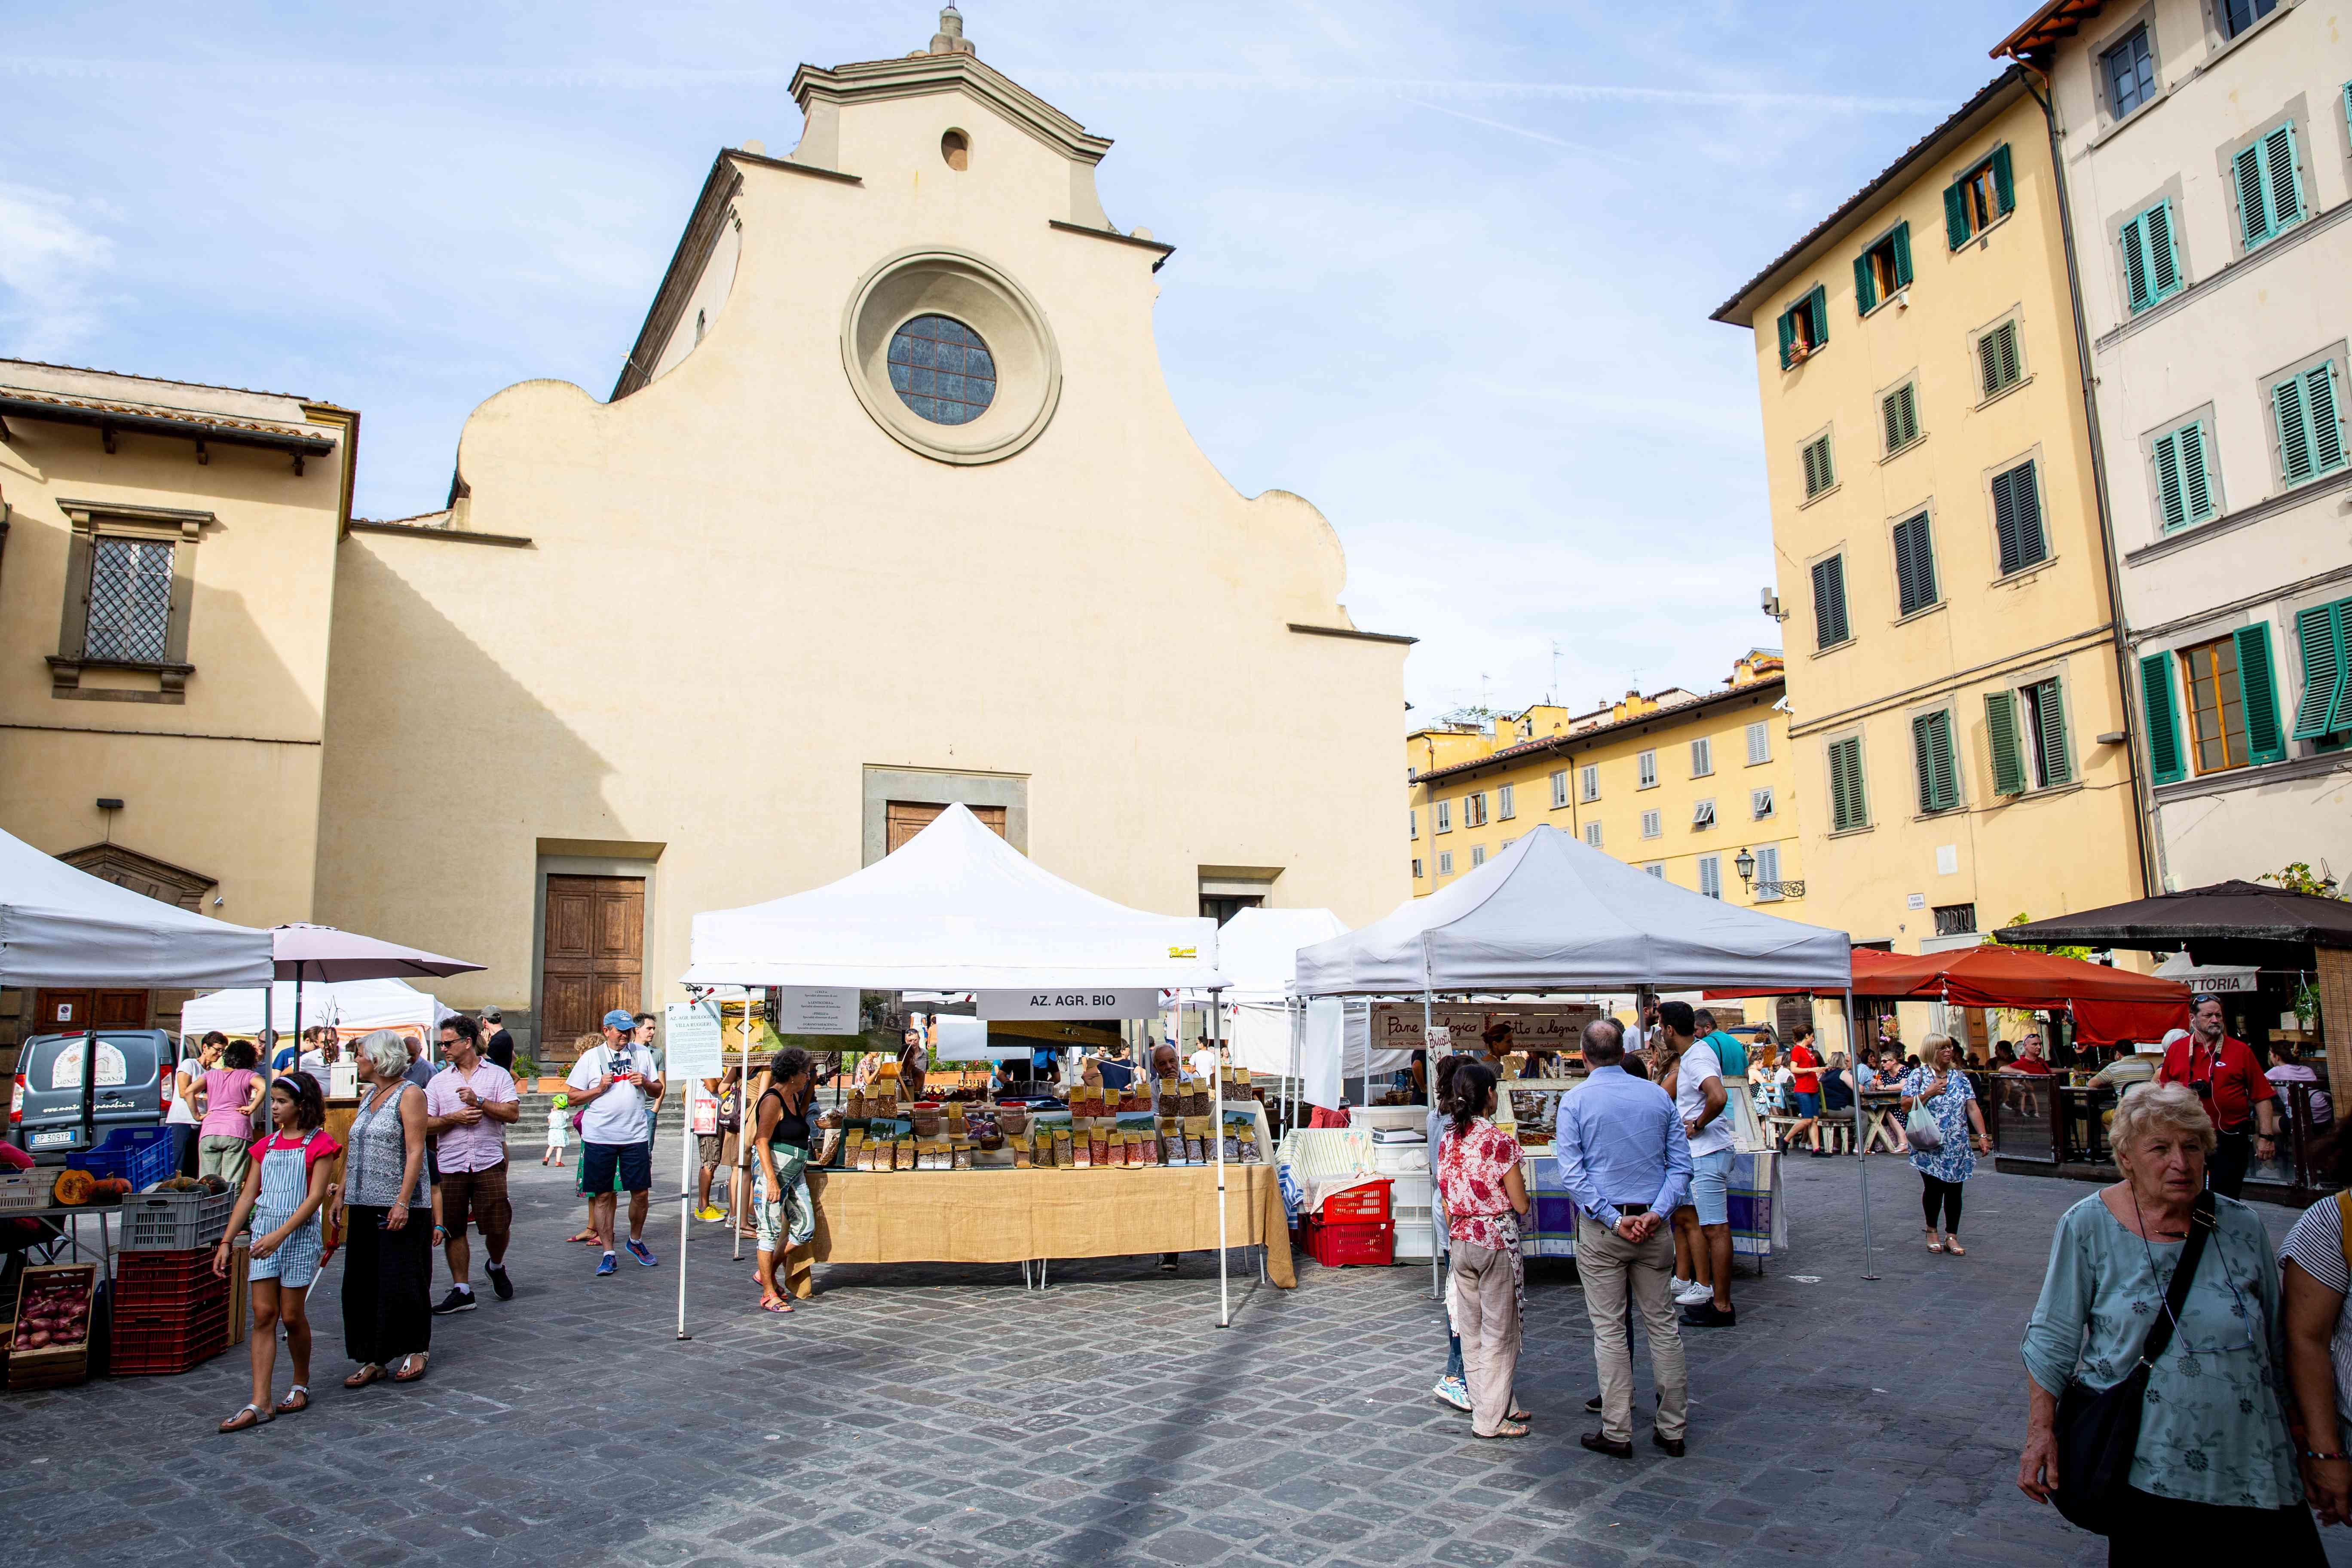 Piazza Santo Spirito in Florence, Italy